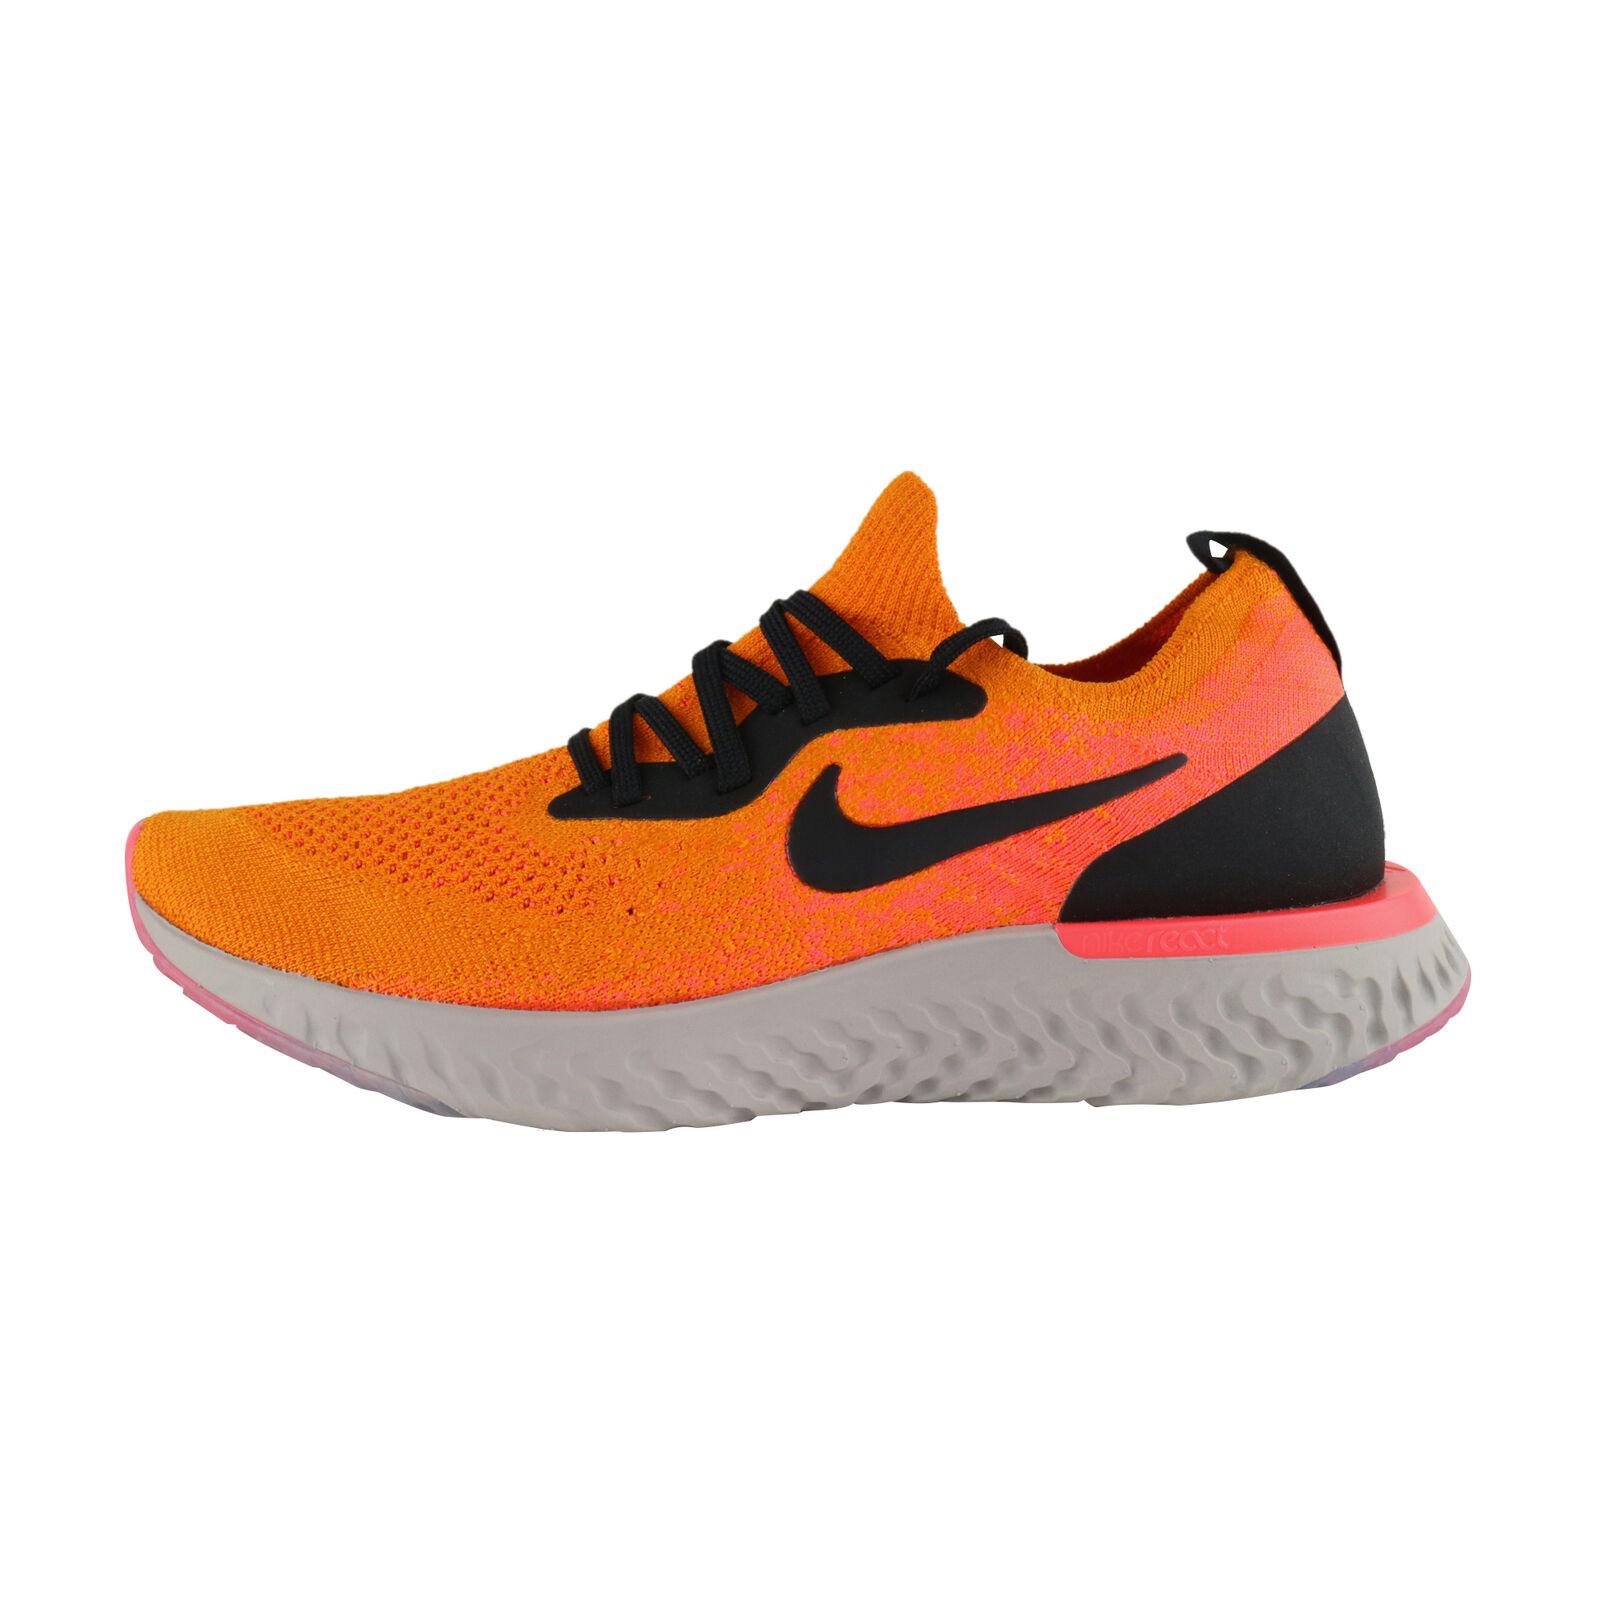 Kaufen Sie Nike Epic React Flyknit Laufschuhe Copper Flash